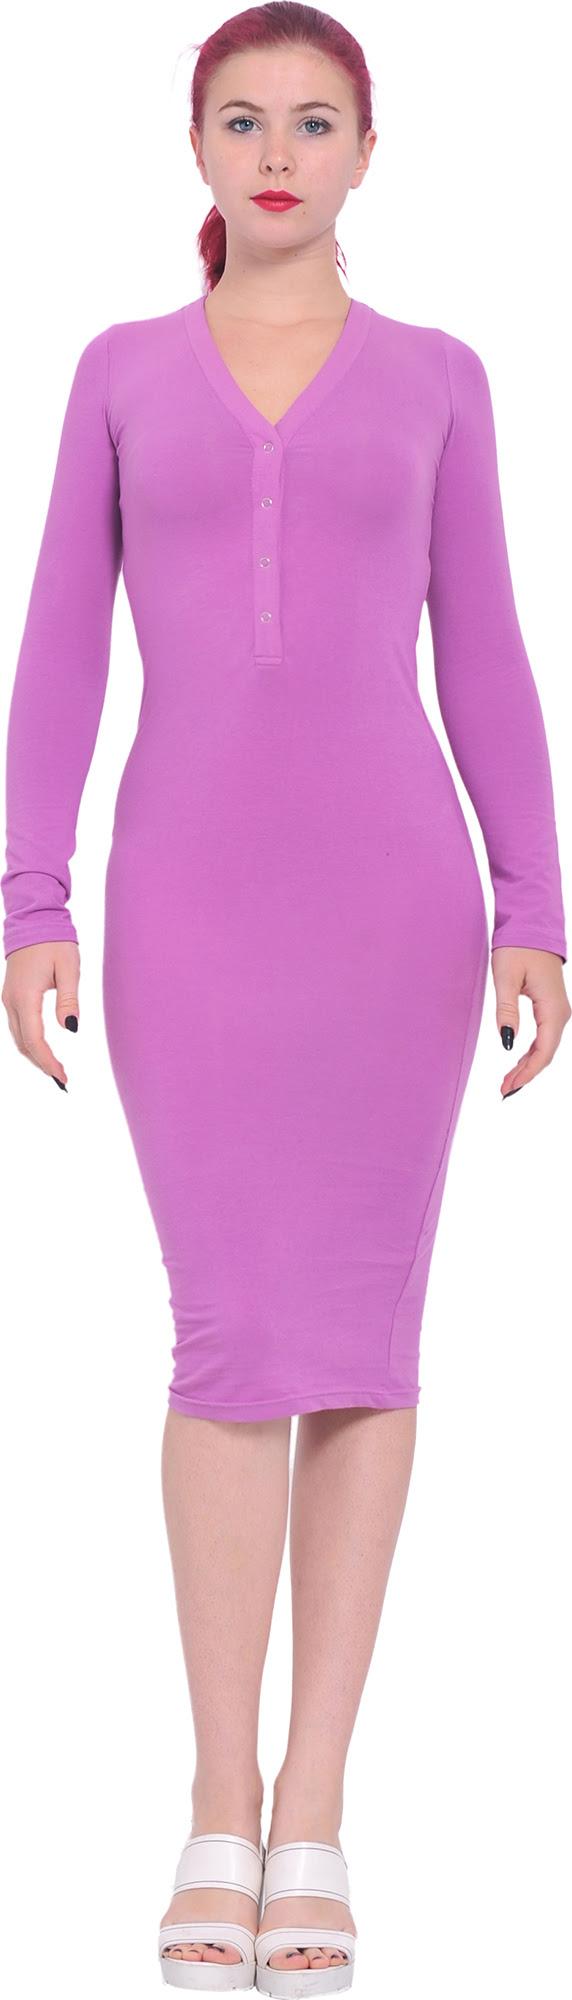 Knee bodycon length long sleeve dress retailers usa with